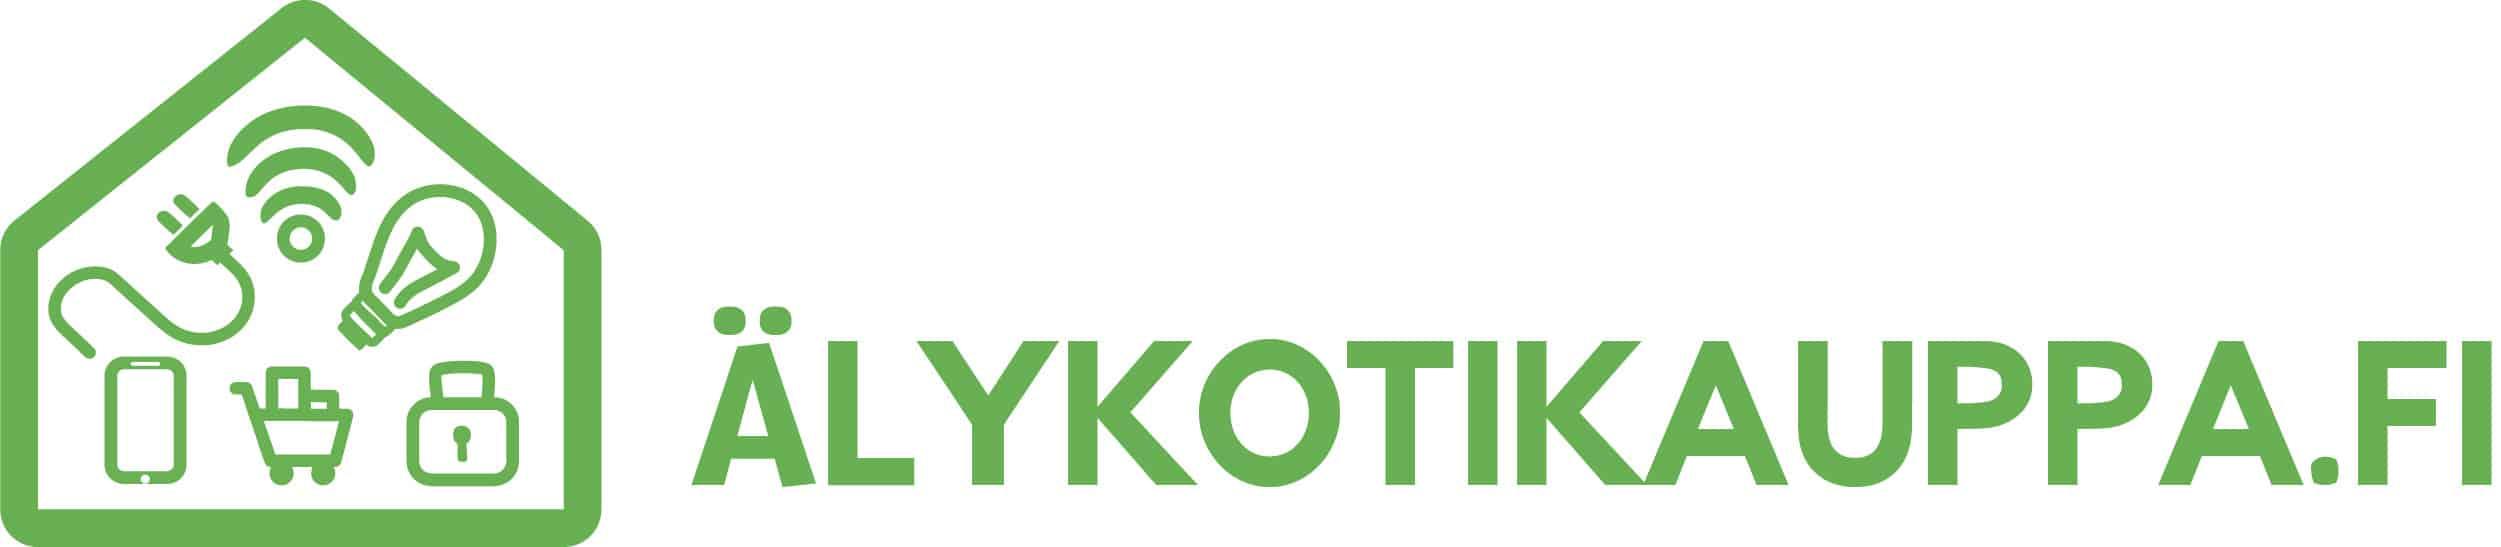 Älykotikaupan logo